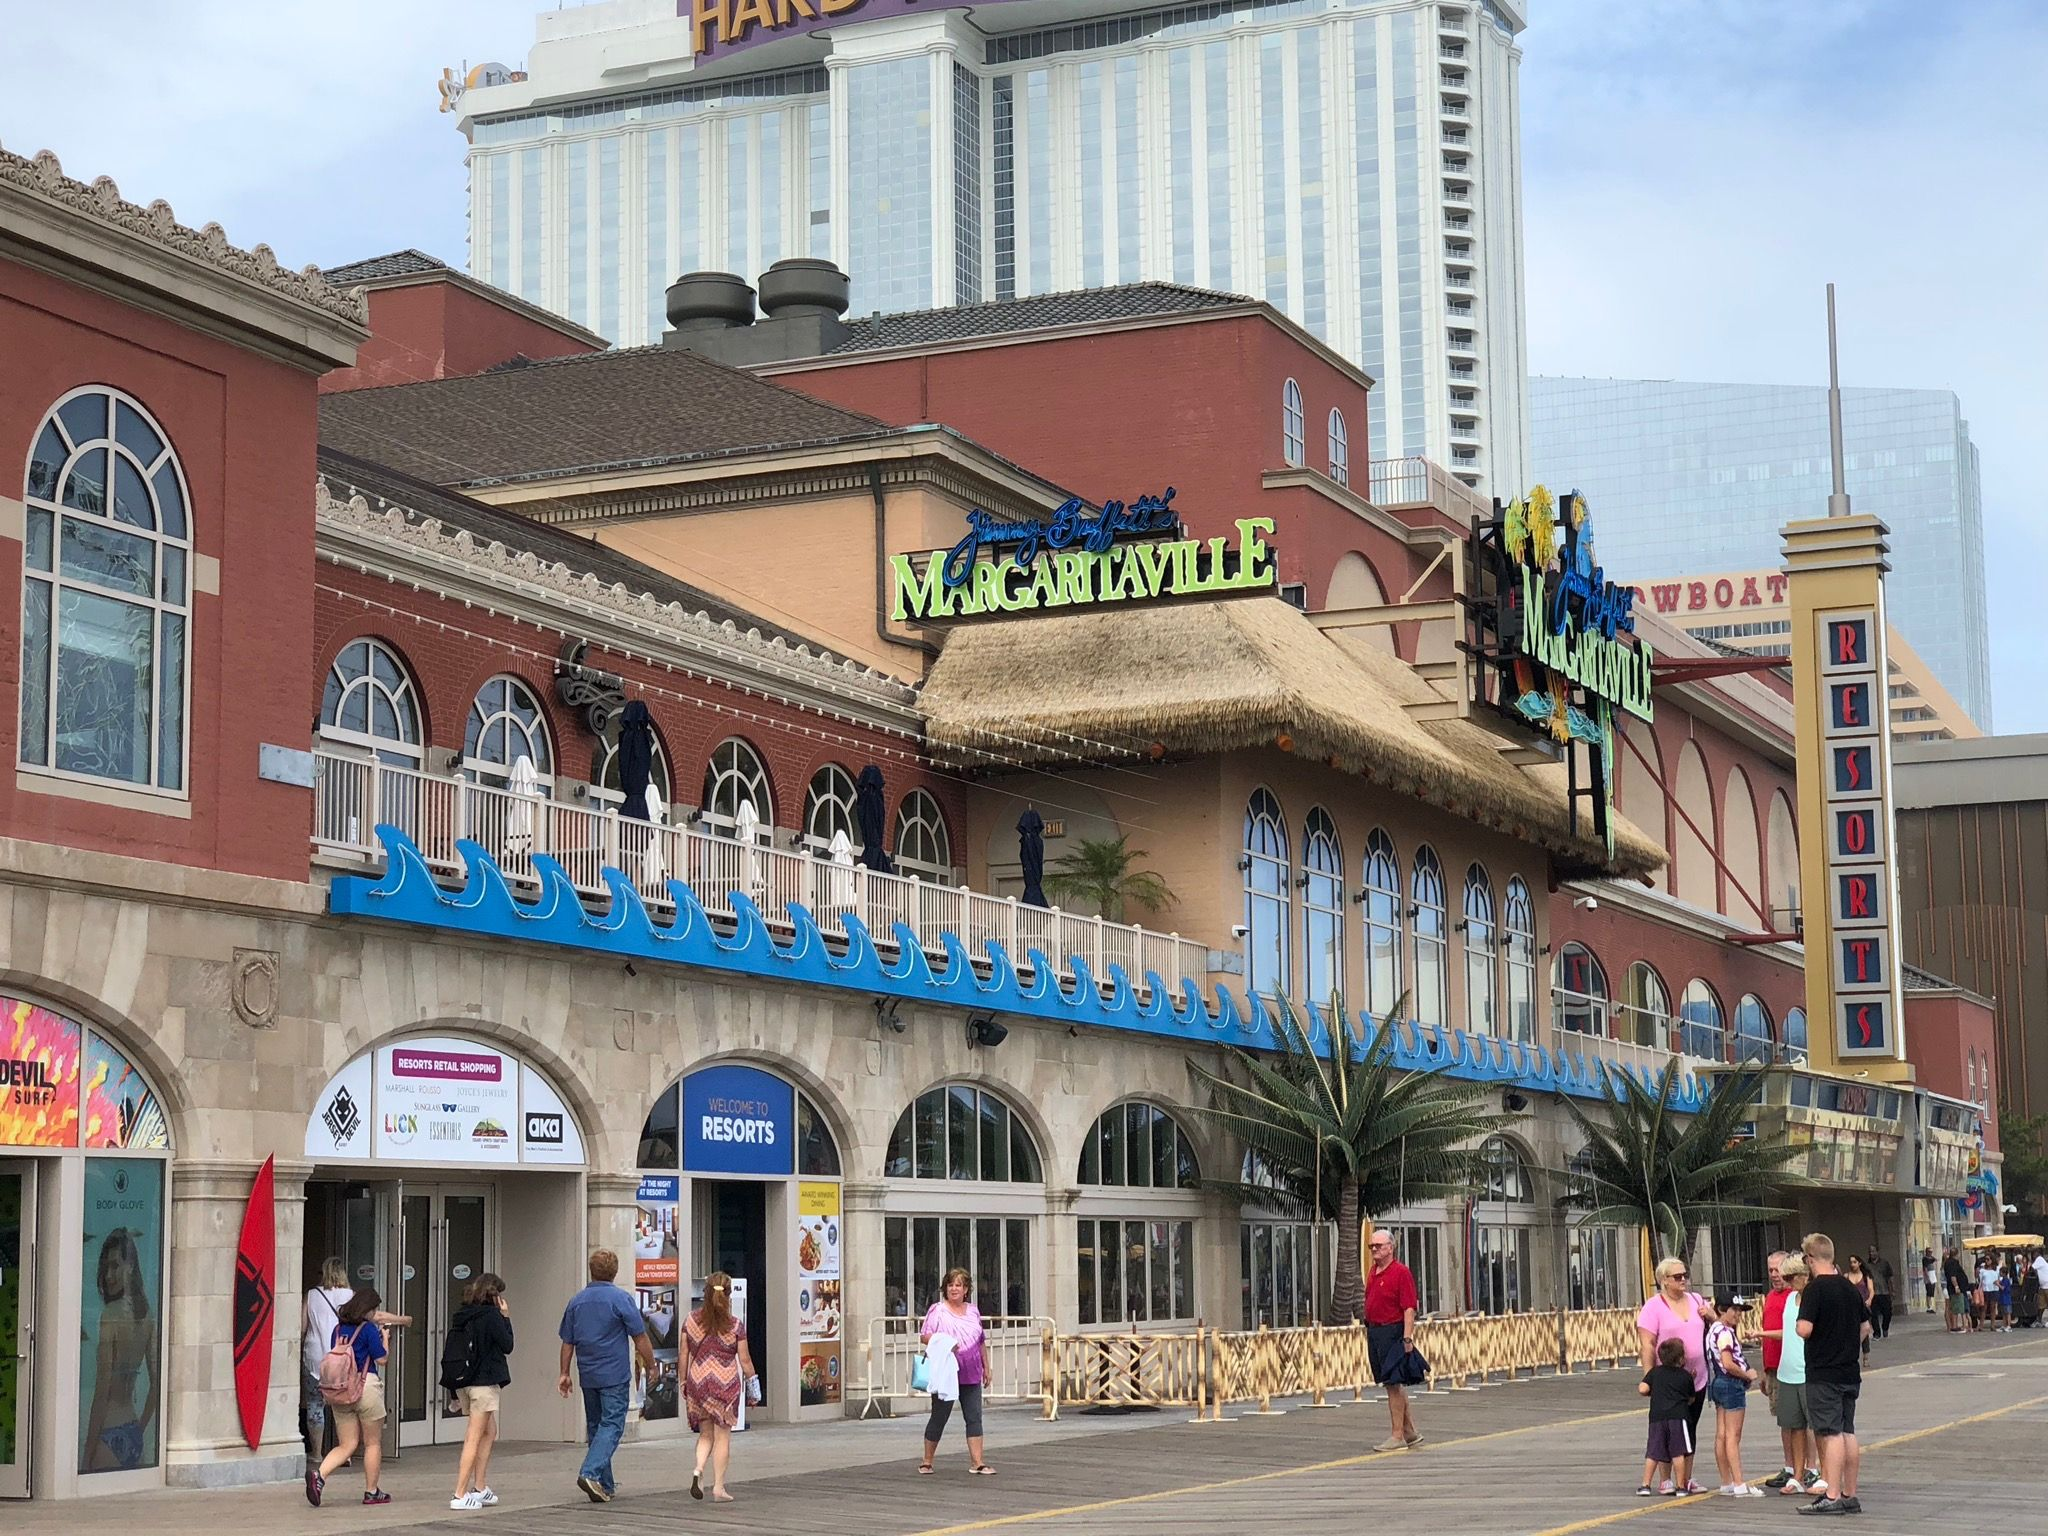 Margaritaville Restaurant Resorts Casino Hotel Atlantic City New Jersey Casino Resort Casino Hotel Atlantic City